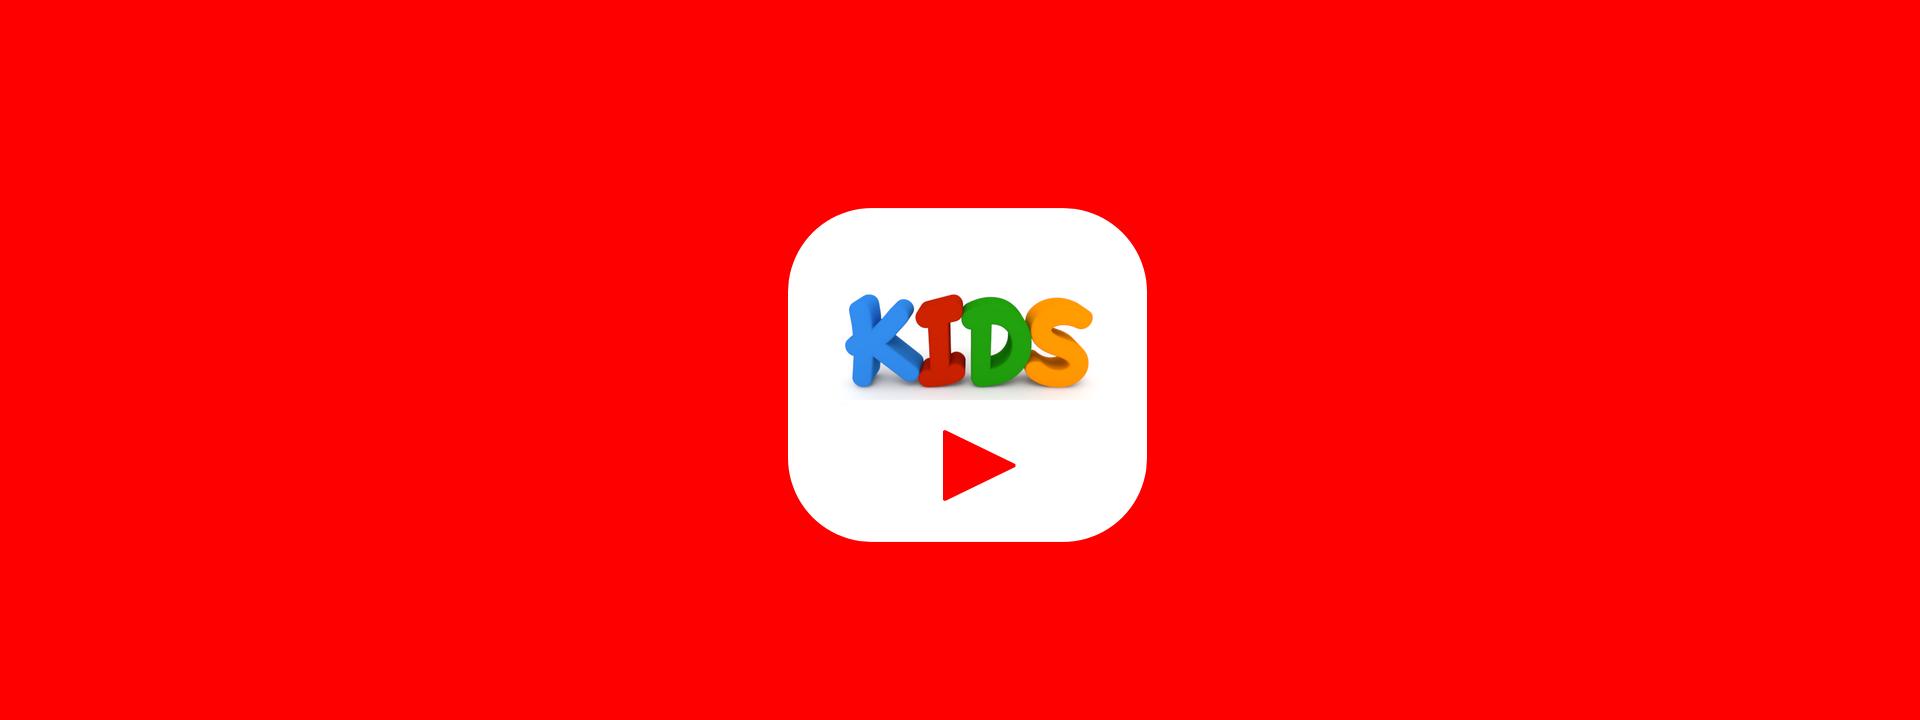 Kids for YouTube ...